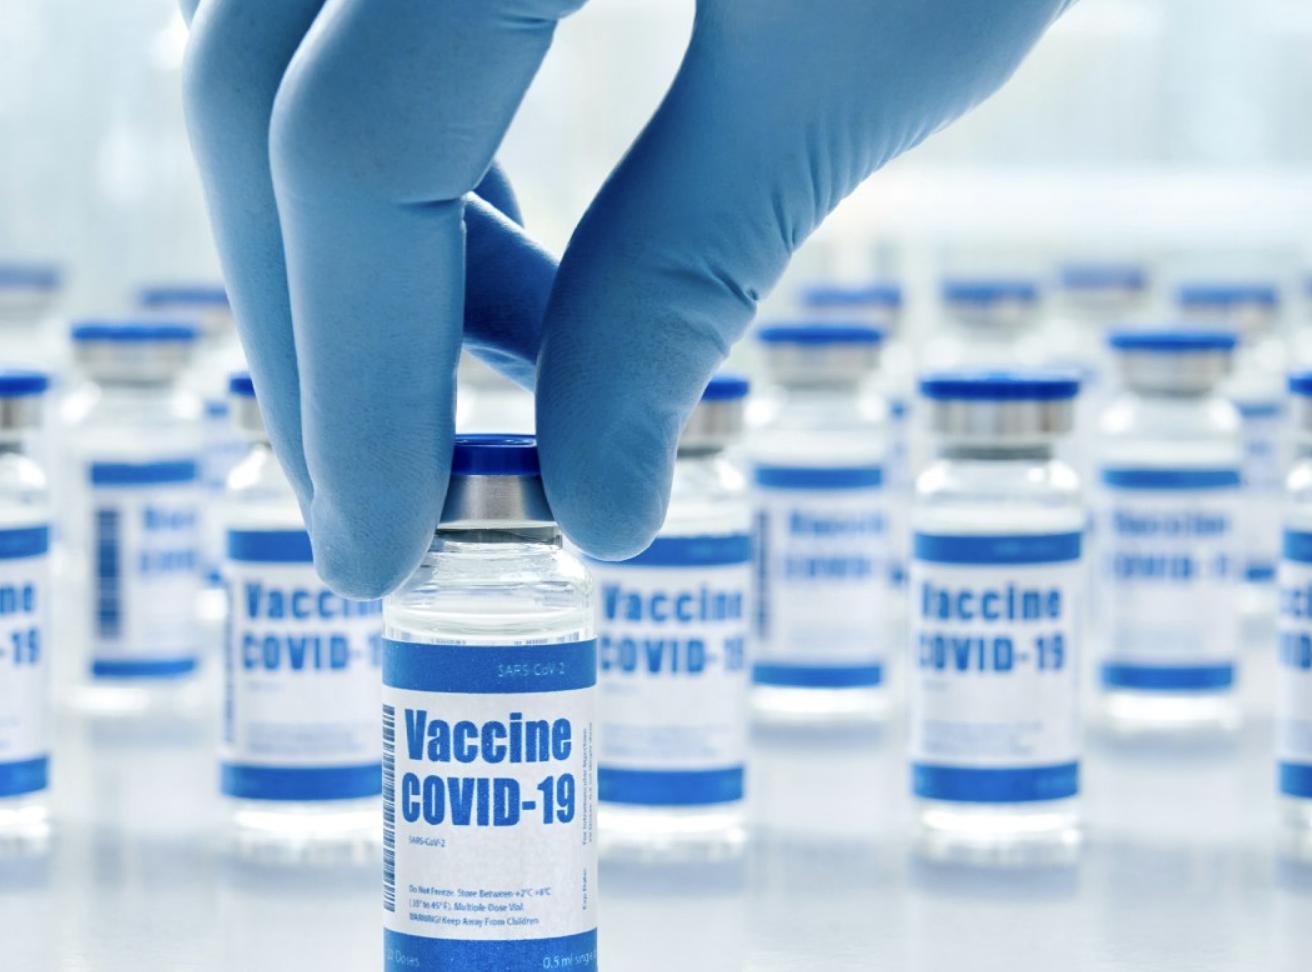 UAE Covid vaccine: Abu Dhabi approves screening protocols